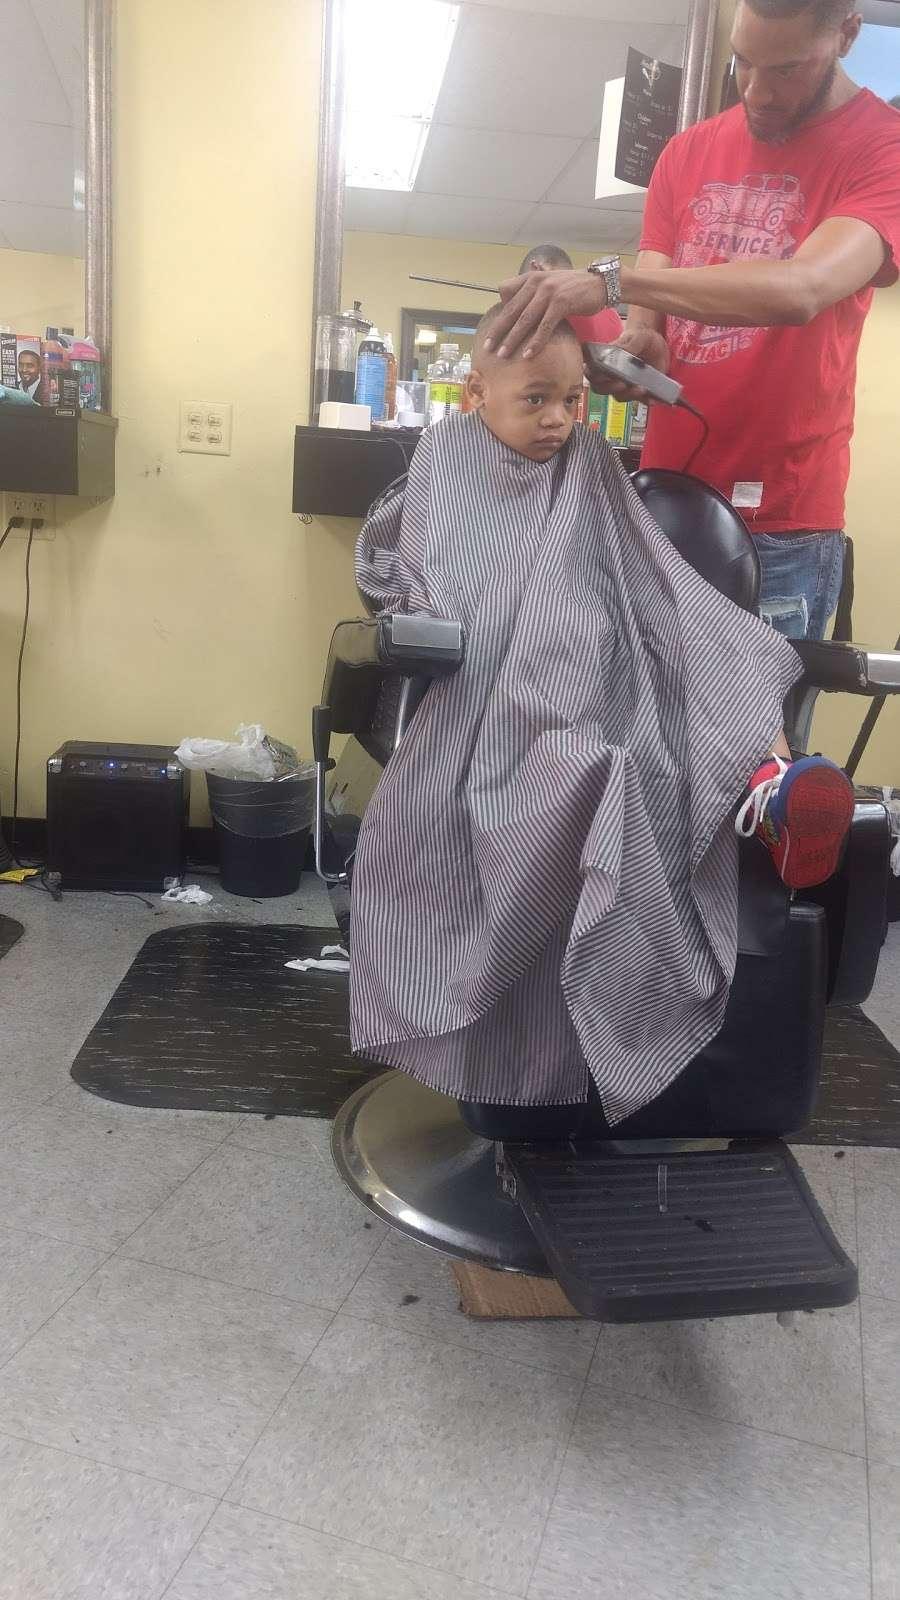 Headliner LLC - hair care  | Photo 1 of 6 | Address: 1551 Springfield Ave, Maplewood, NJ 07040, USA | Phone: (973) 378-5941